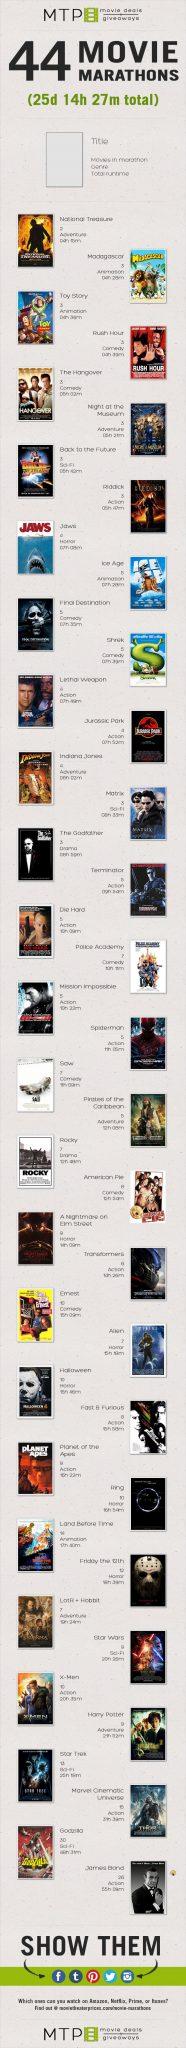 43+ Movie Marathons To Watch - Movie Theater Prices